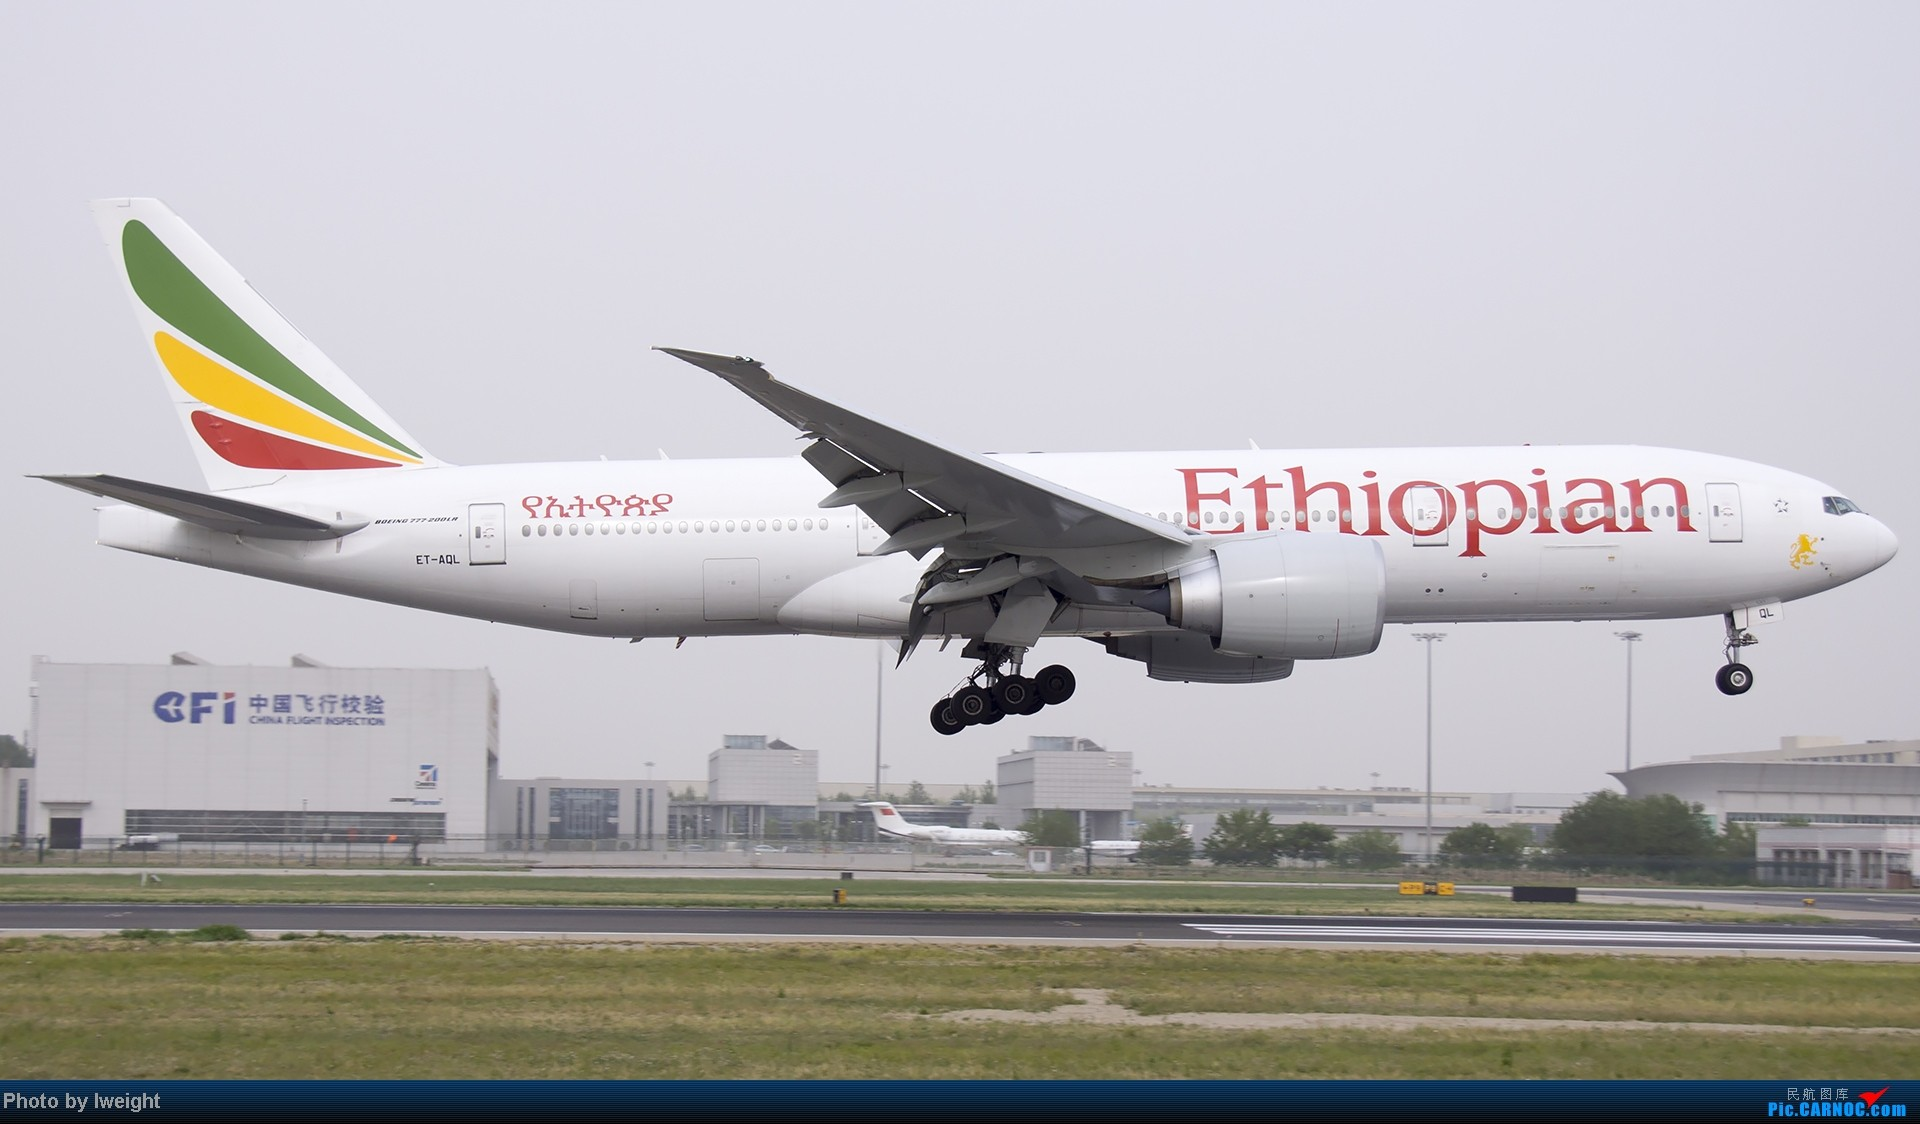 Re:[原创]霾天首都机场随拍 BOEING 777-200LR ET-AQL 中国北京首都机场